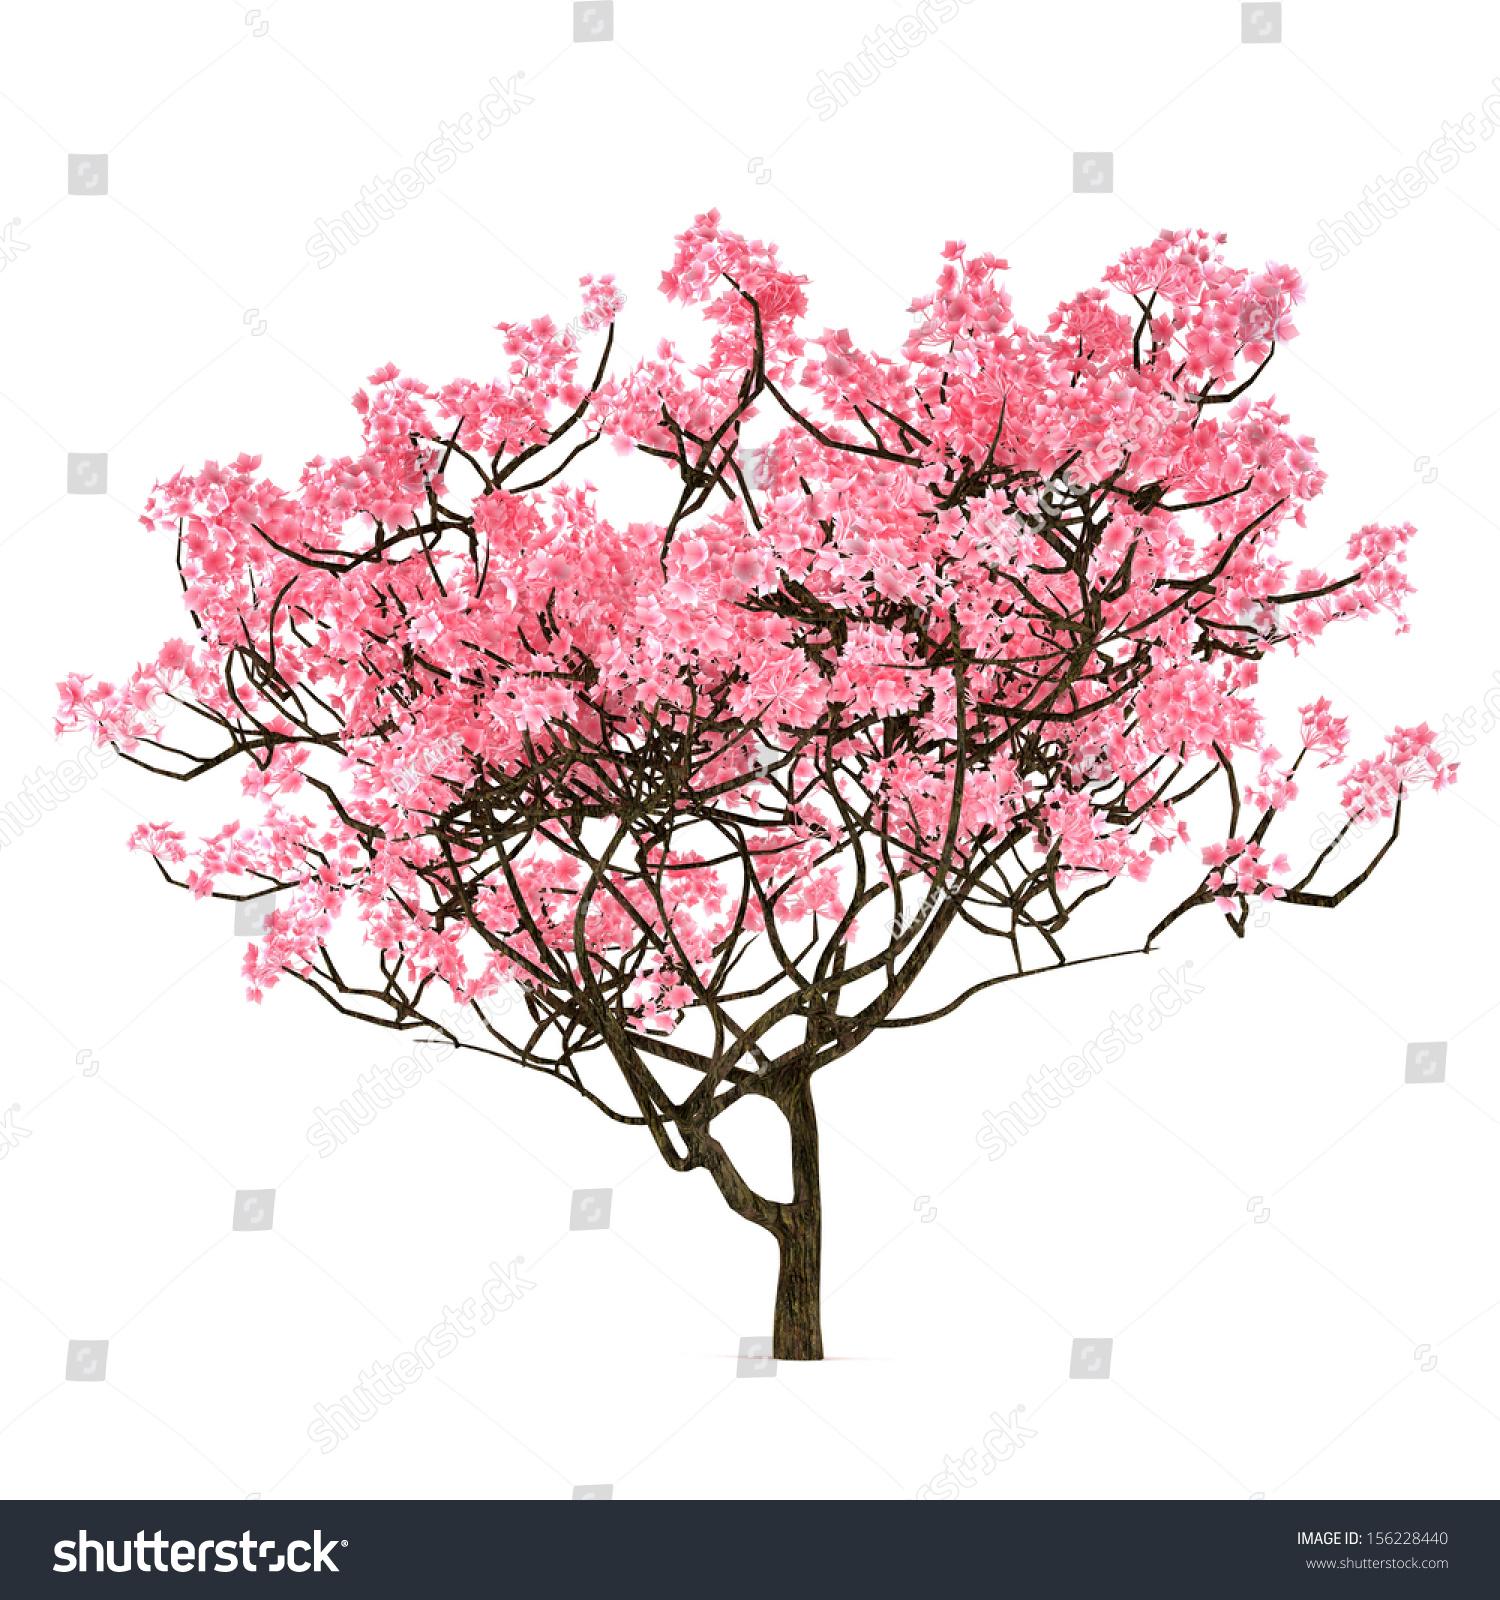 diagram the parts of cherry blossom tree 2002 ford f350 fuse box sakura isolated stock illustration 156228440